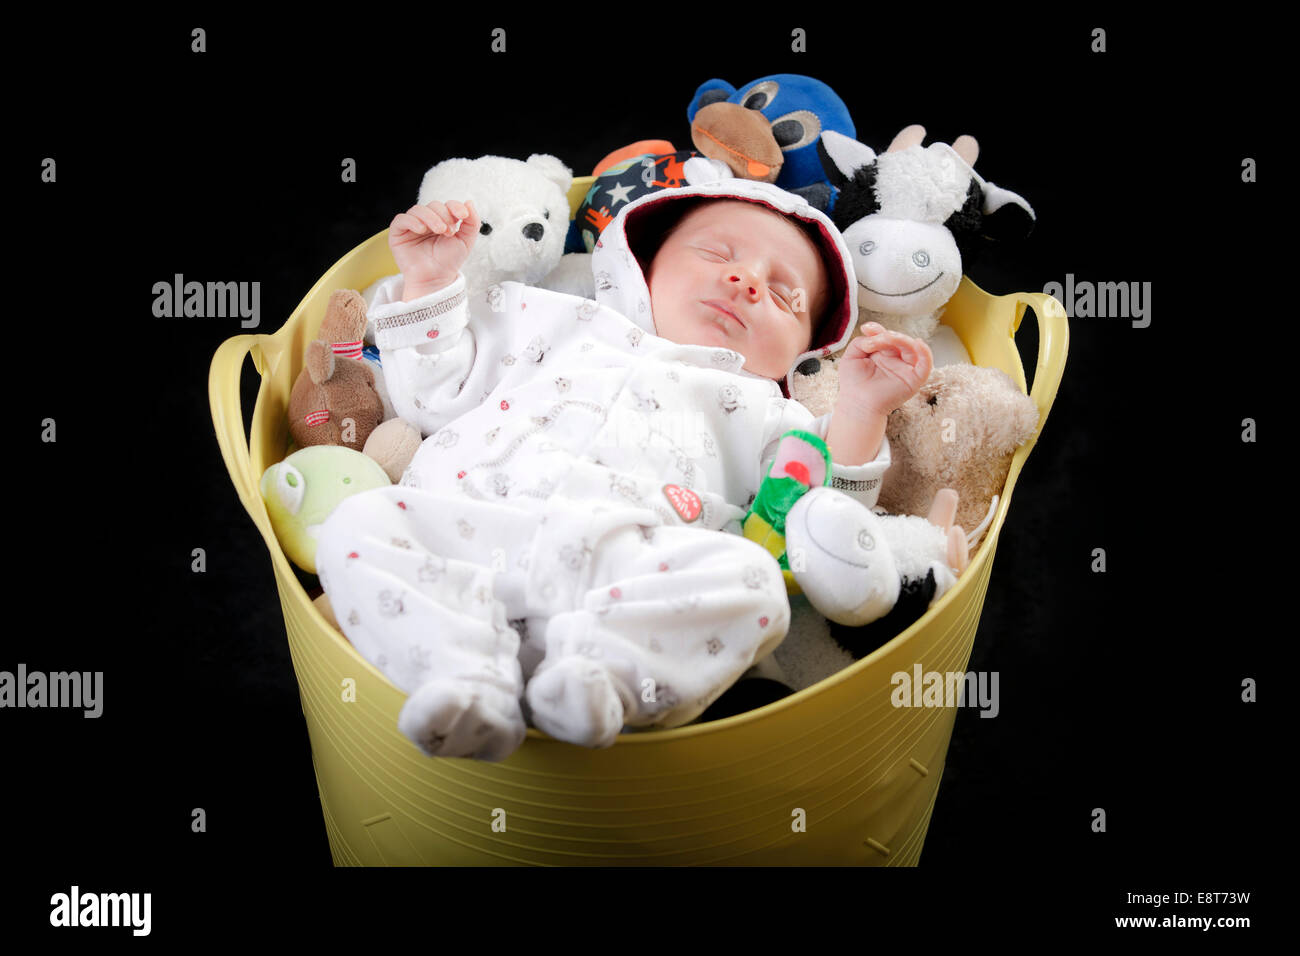 Baby sleeping in a bucket full of stuffed animals - Stock Image